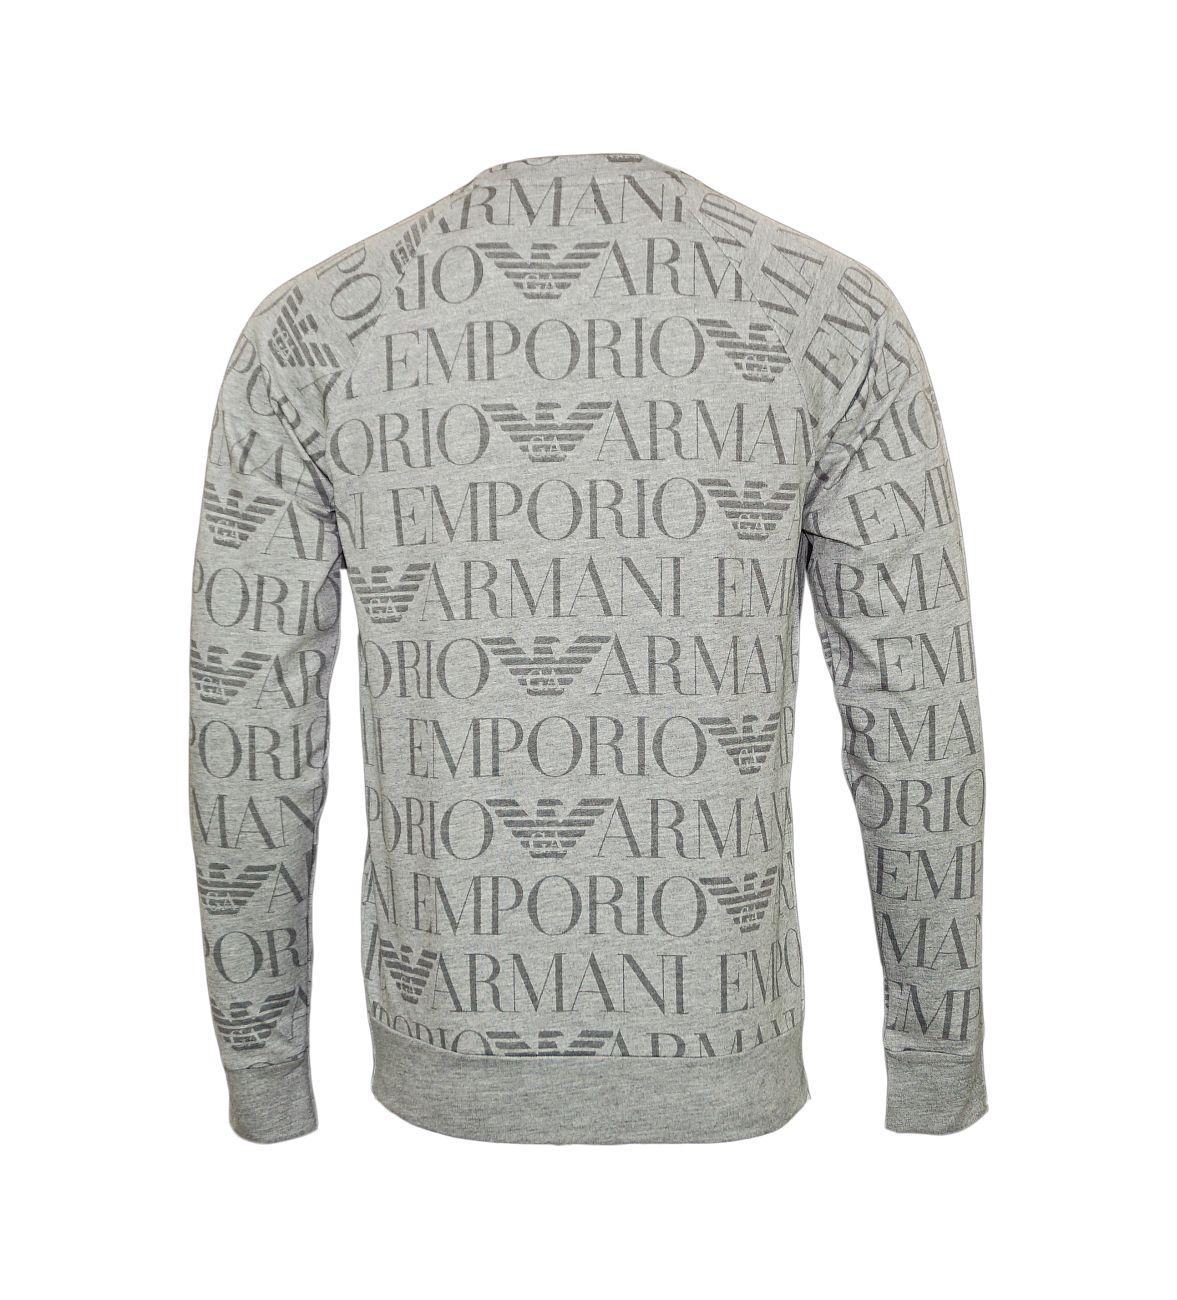 Emporio Armani Sweater Rundhals Pullover 111062 8P566 04748 F18-EAS1